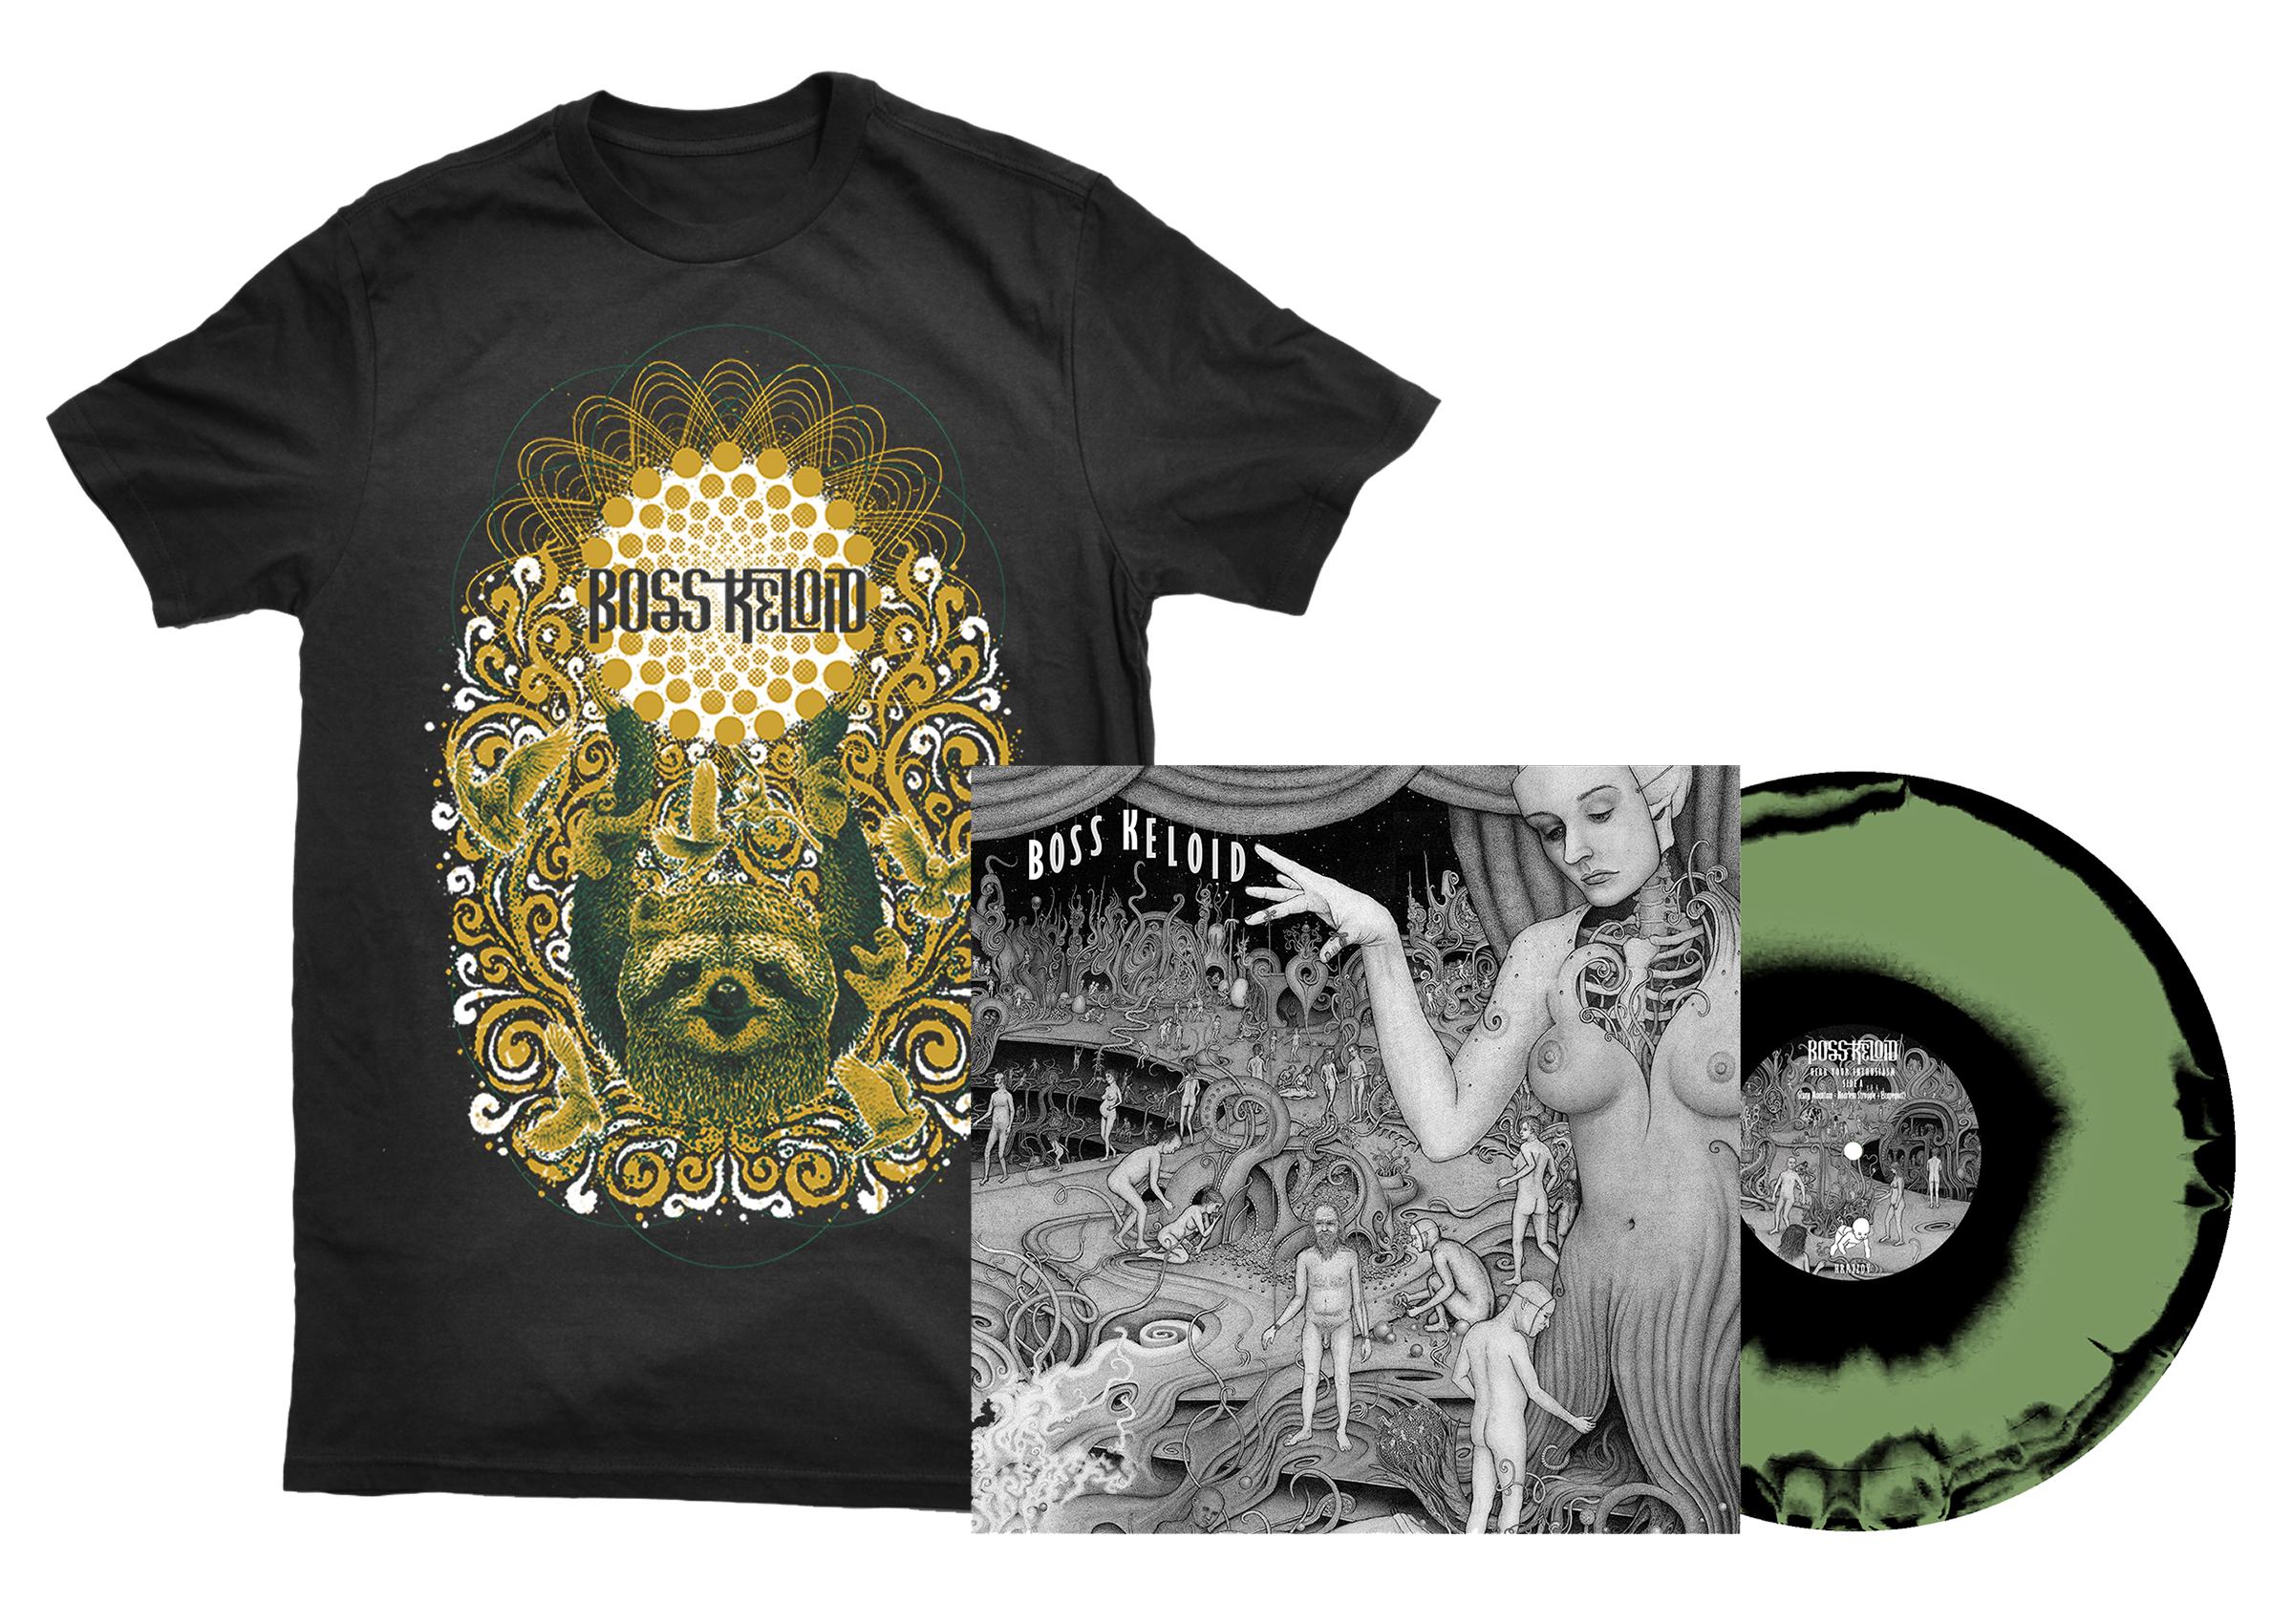 Boss Keloid - Herb Your Enthusiasm shirt + 2xLP + CD PREORDER